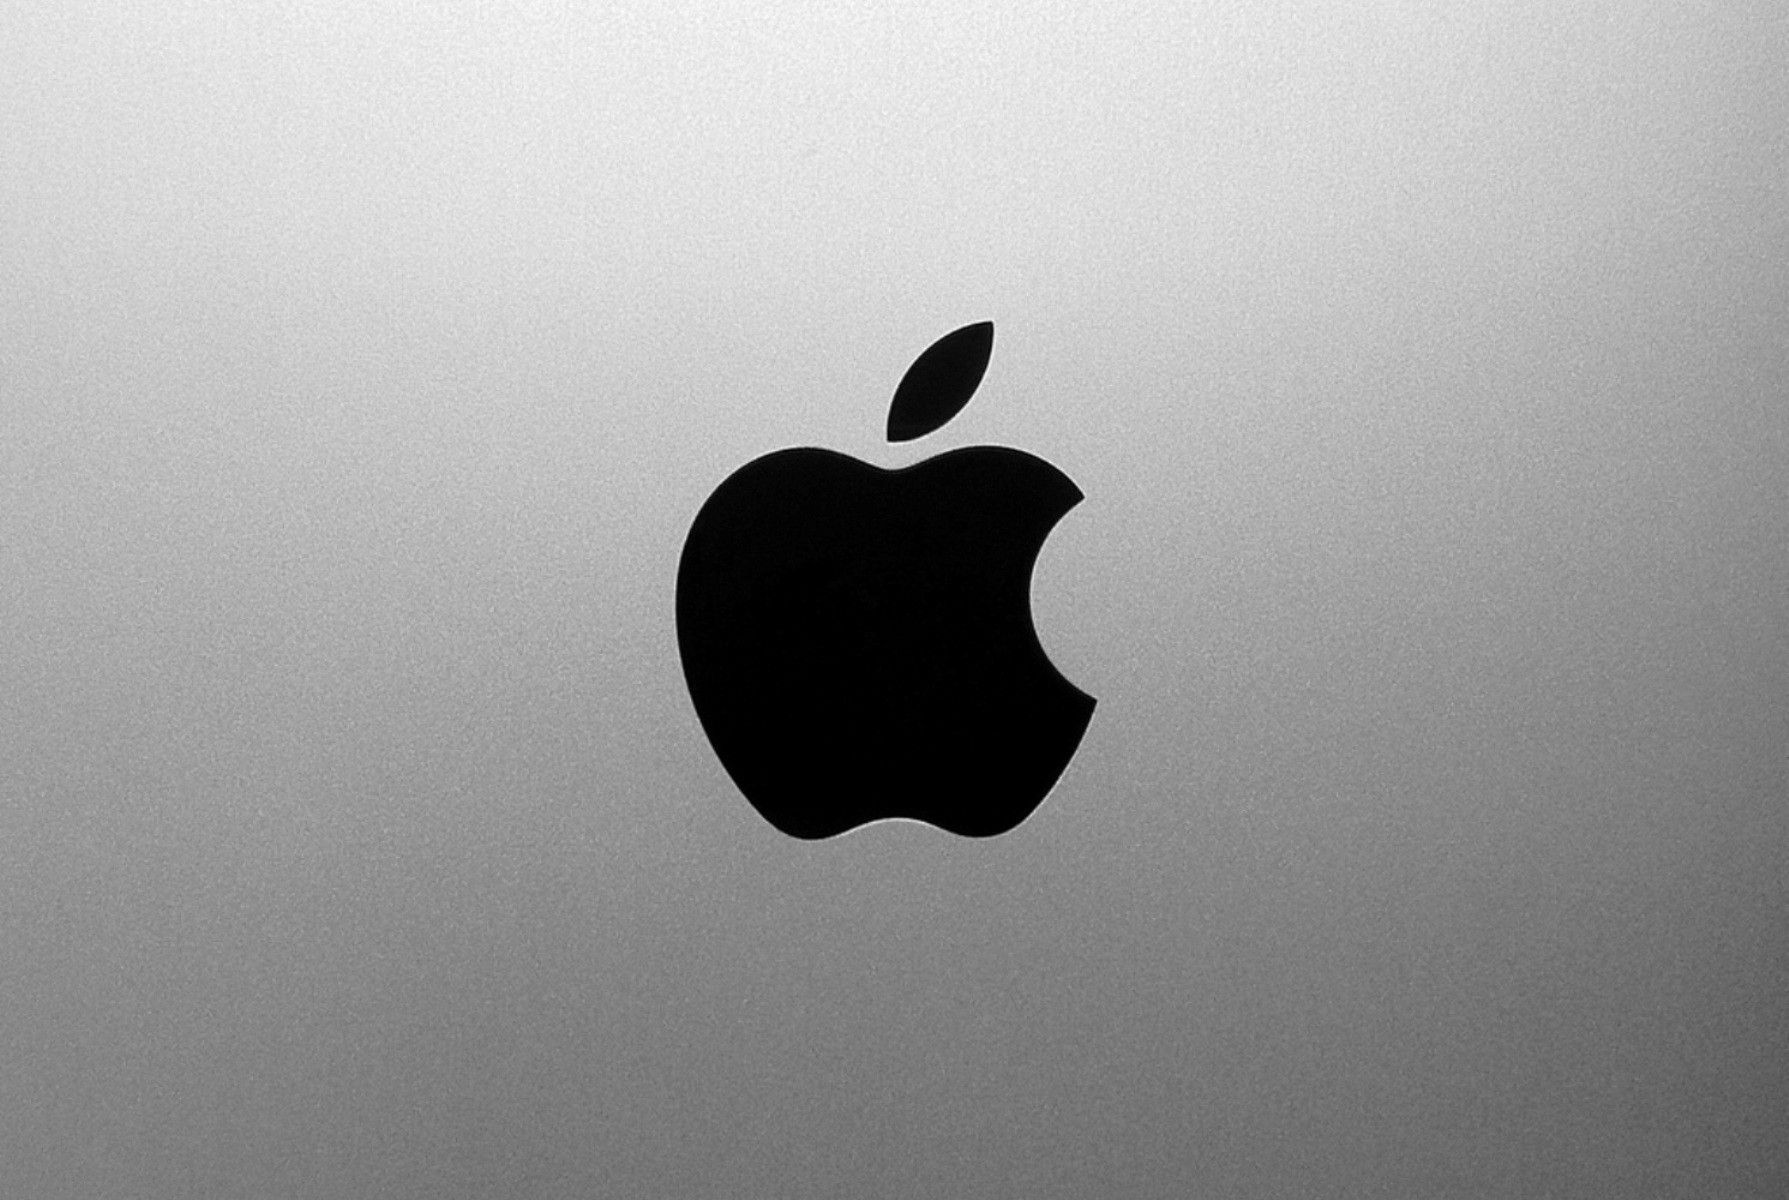 Apple Hd Wallpapers Apple Logo Desktop Backgrounds Page Apple Wallpaper Apple Images Hd Wallpaper Iphone